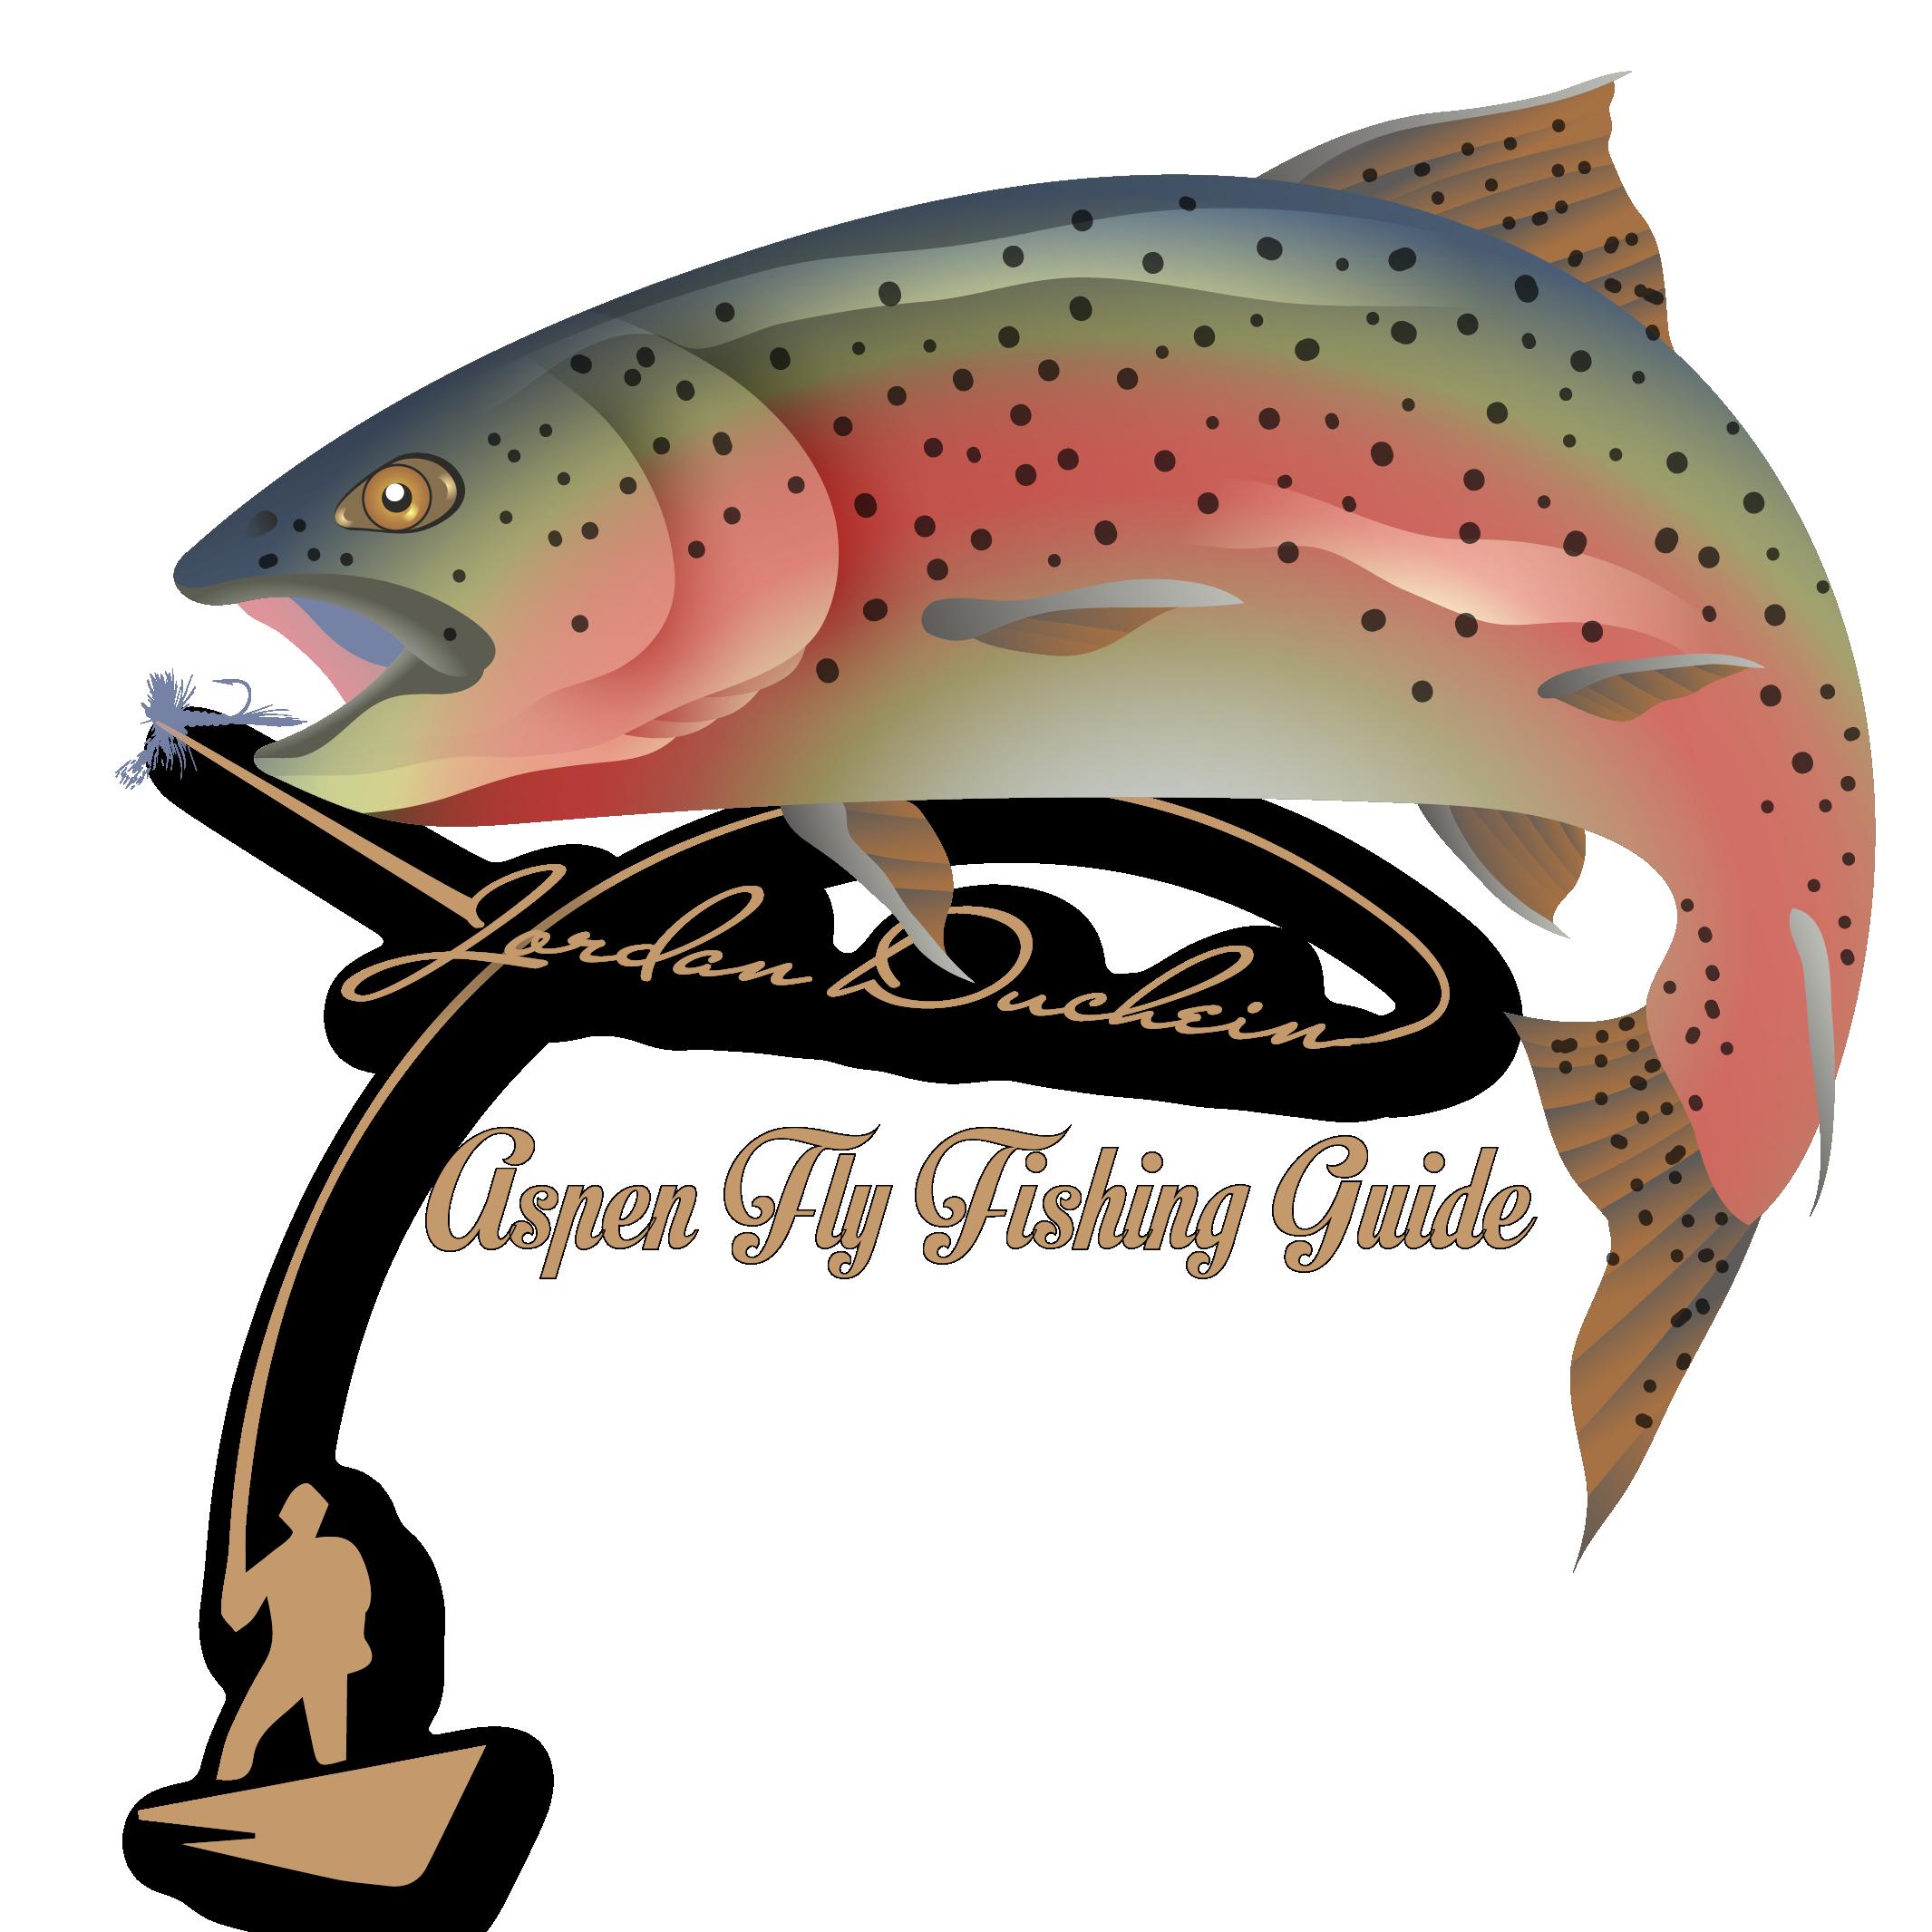 Aspen Fly Fishing Guide